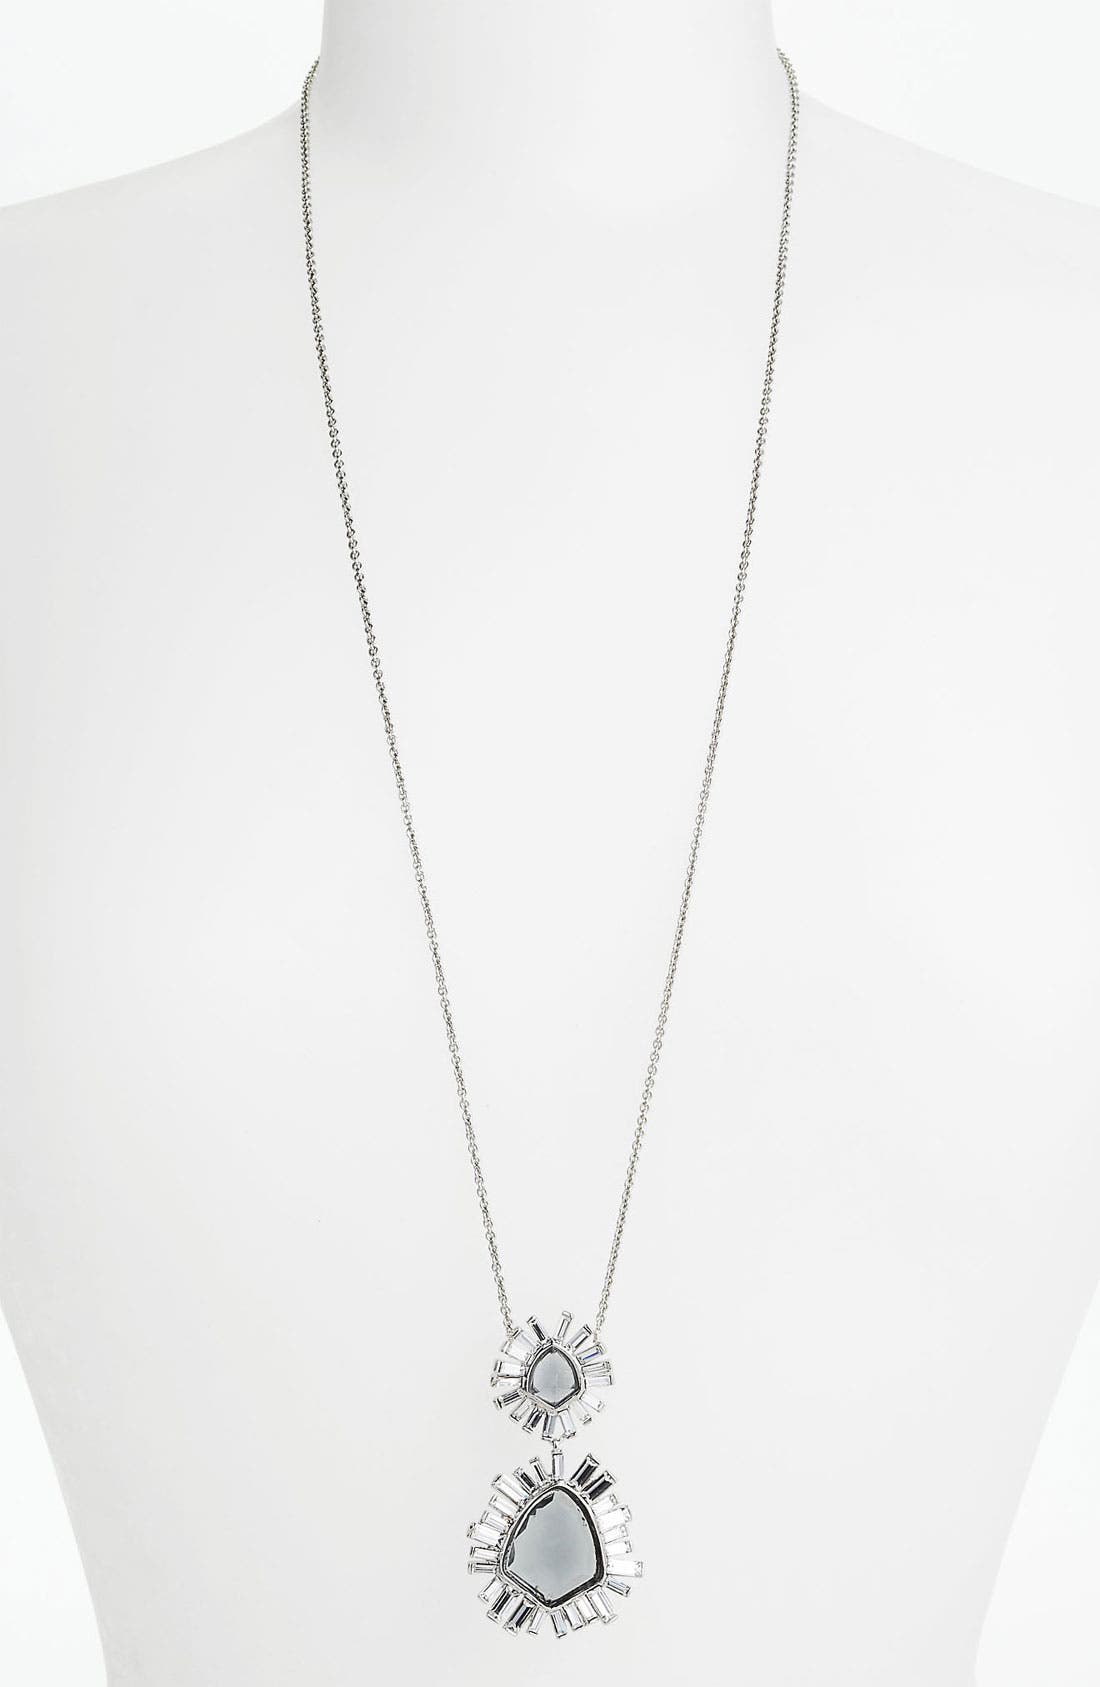 Alternate Image 1 Selected - Alexis Bittar 'Miss Havisham - Bel Air' Long Starburst Pendant Necklace